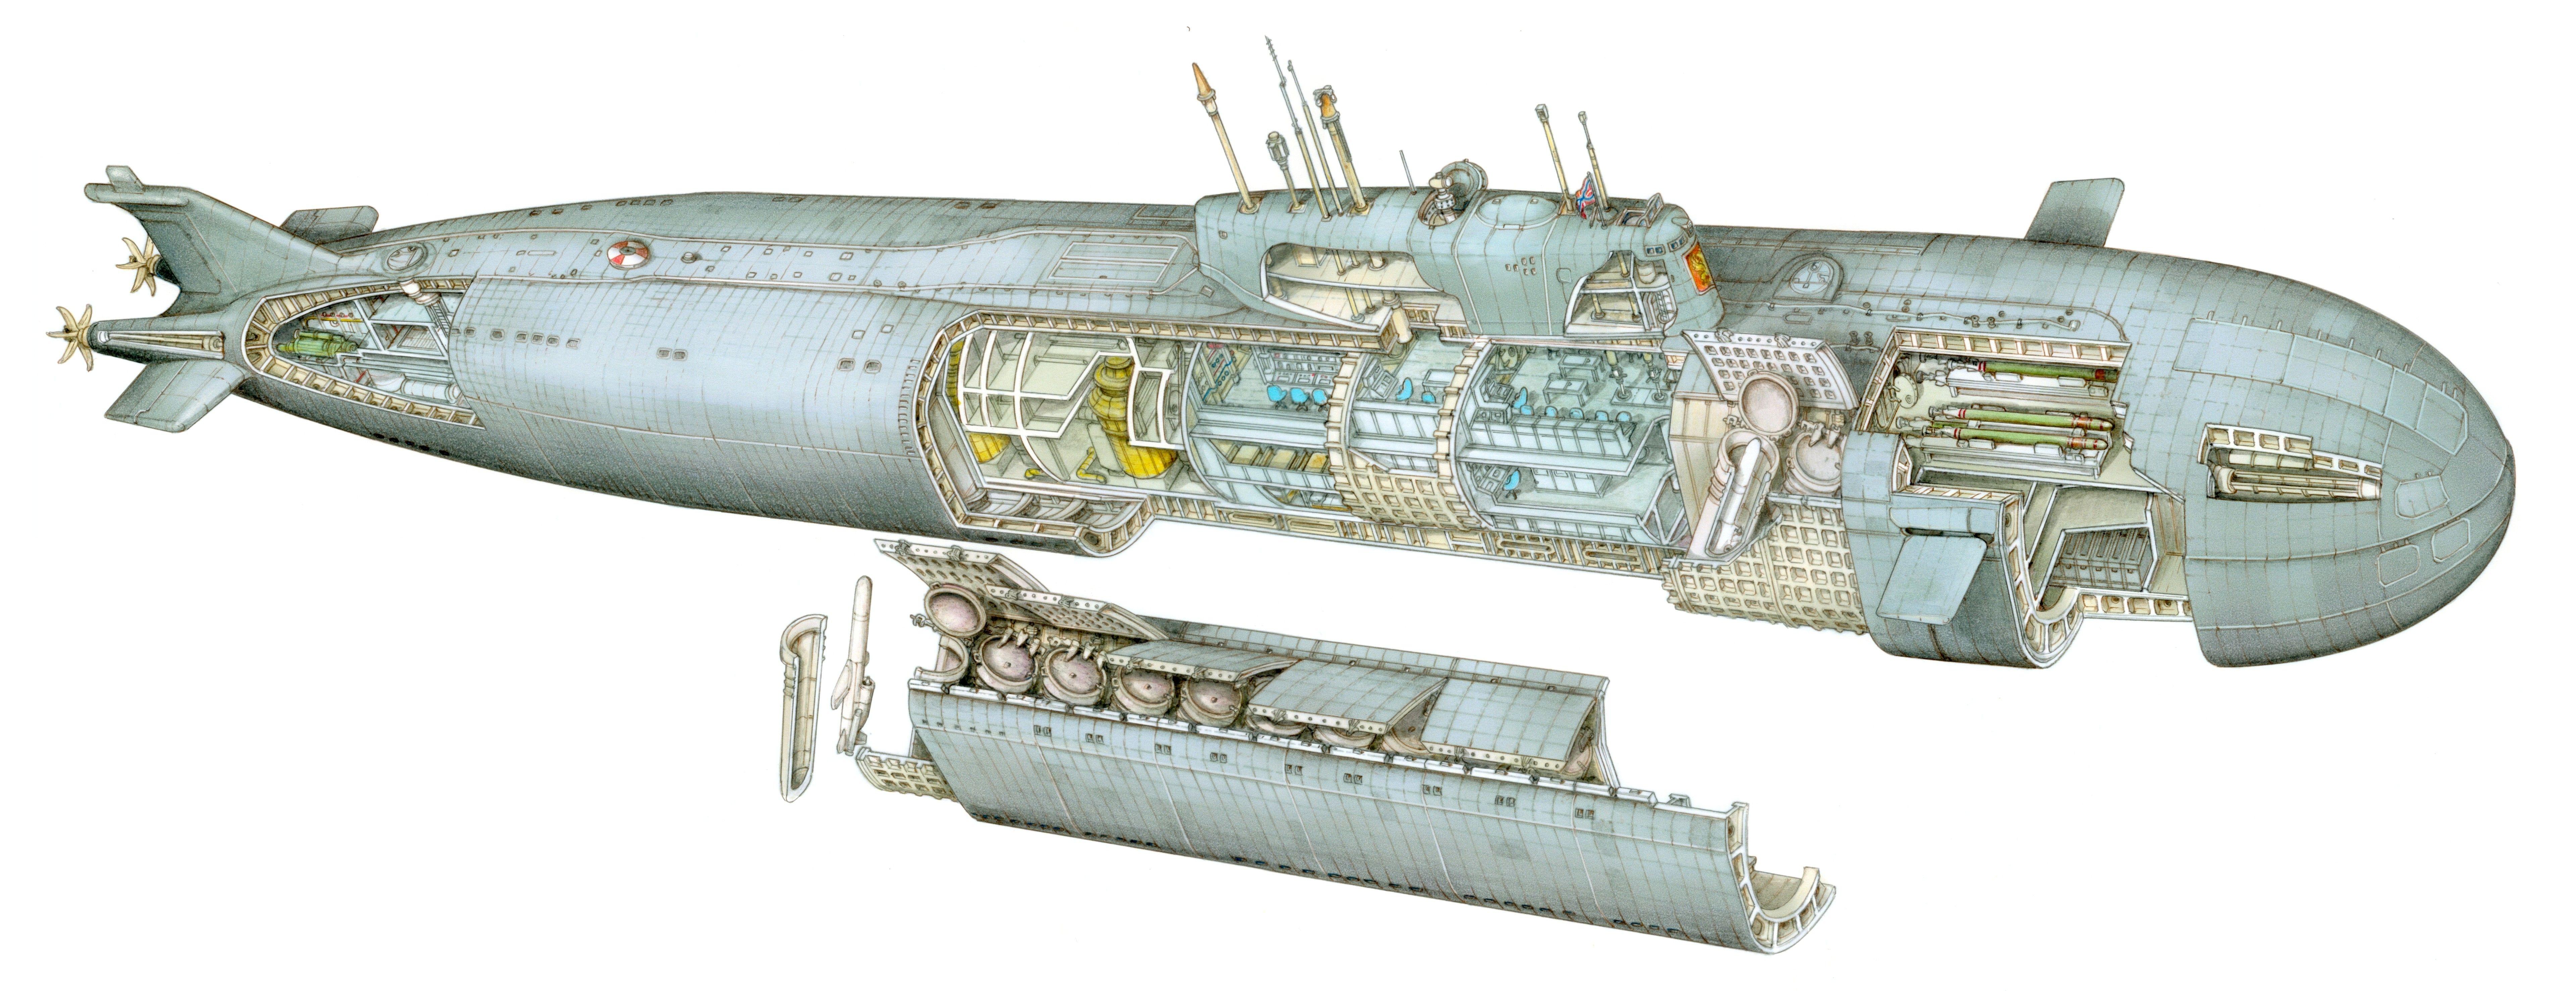 Kursk Nuclear Submarine  U2026